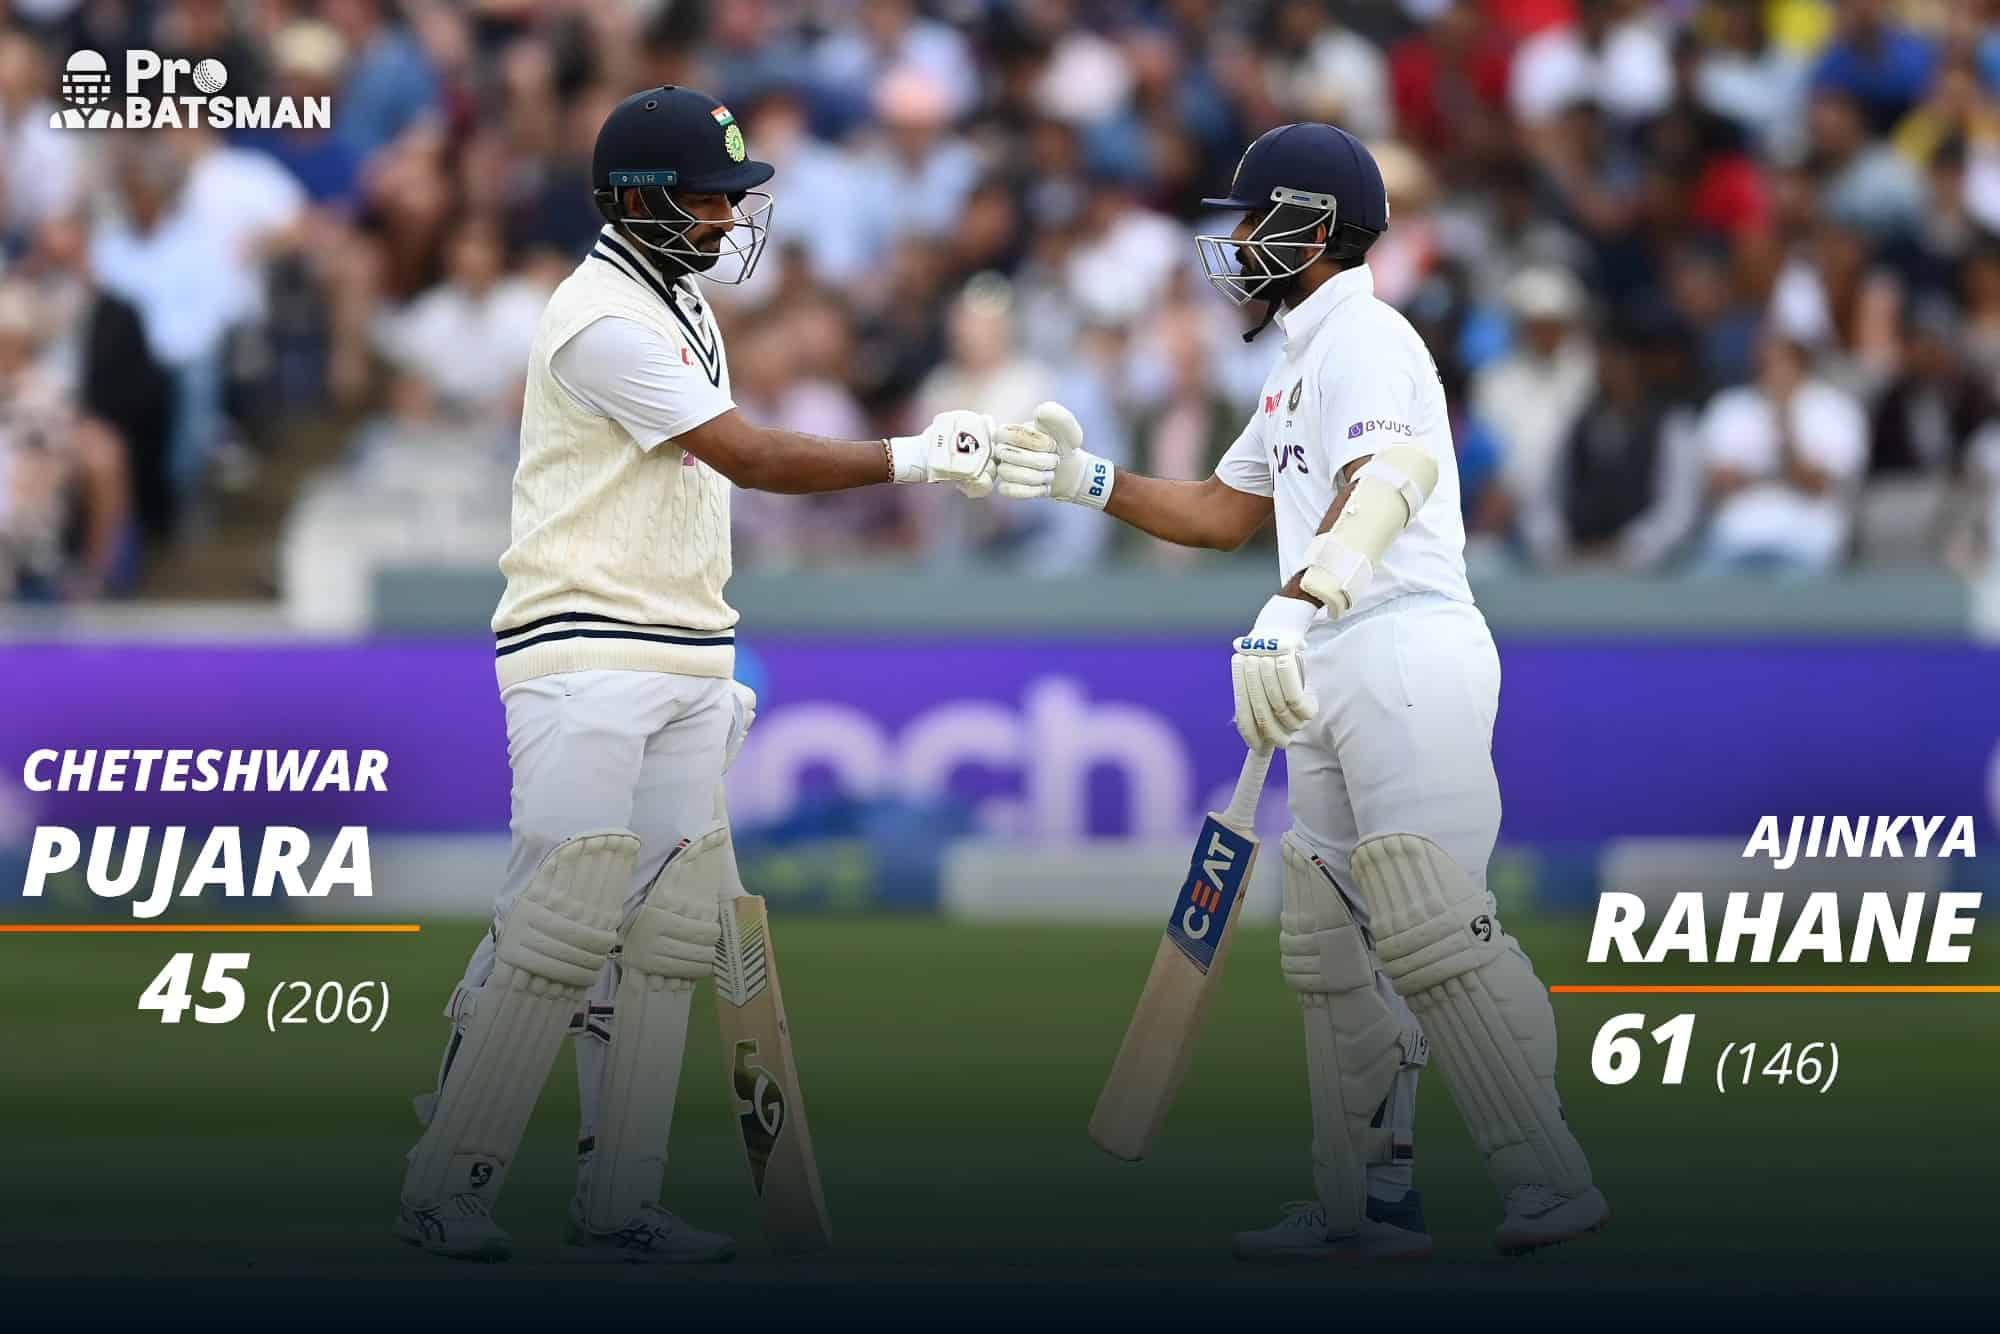 ENG vs IND Cheteshwar Pujara and Ajinkya Rahane - Highest Fourth-Wicket Partnership For India